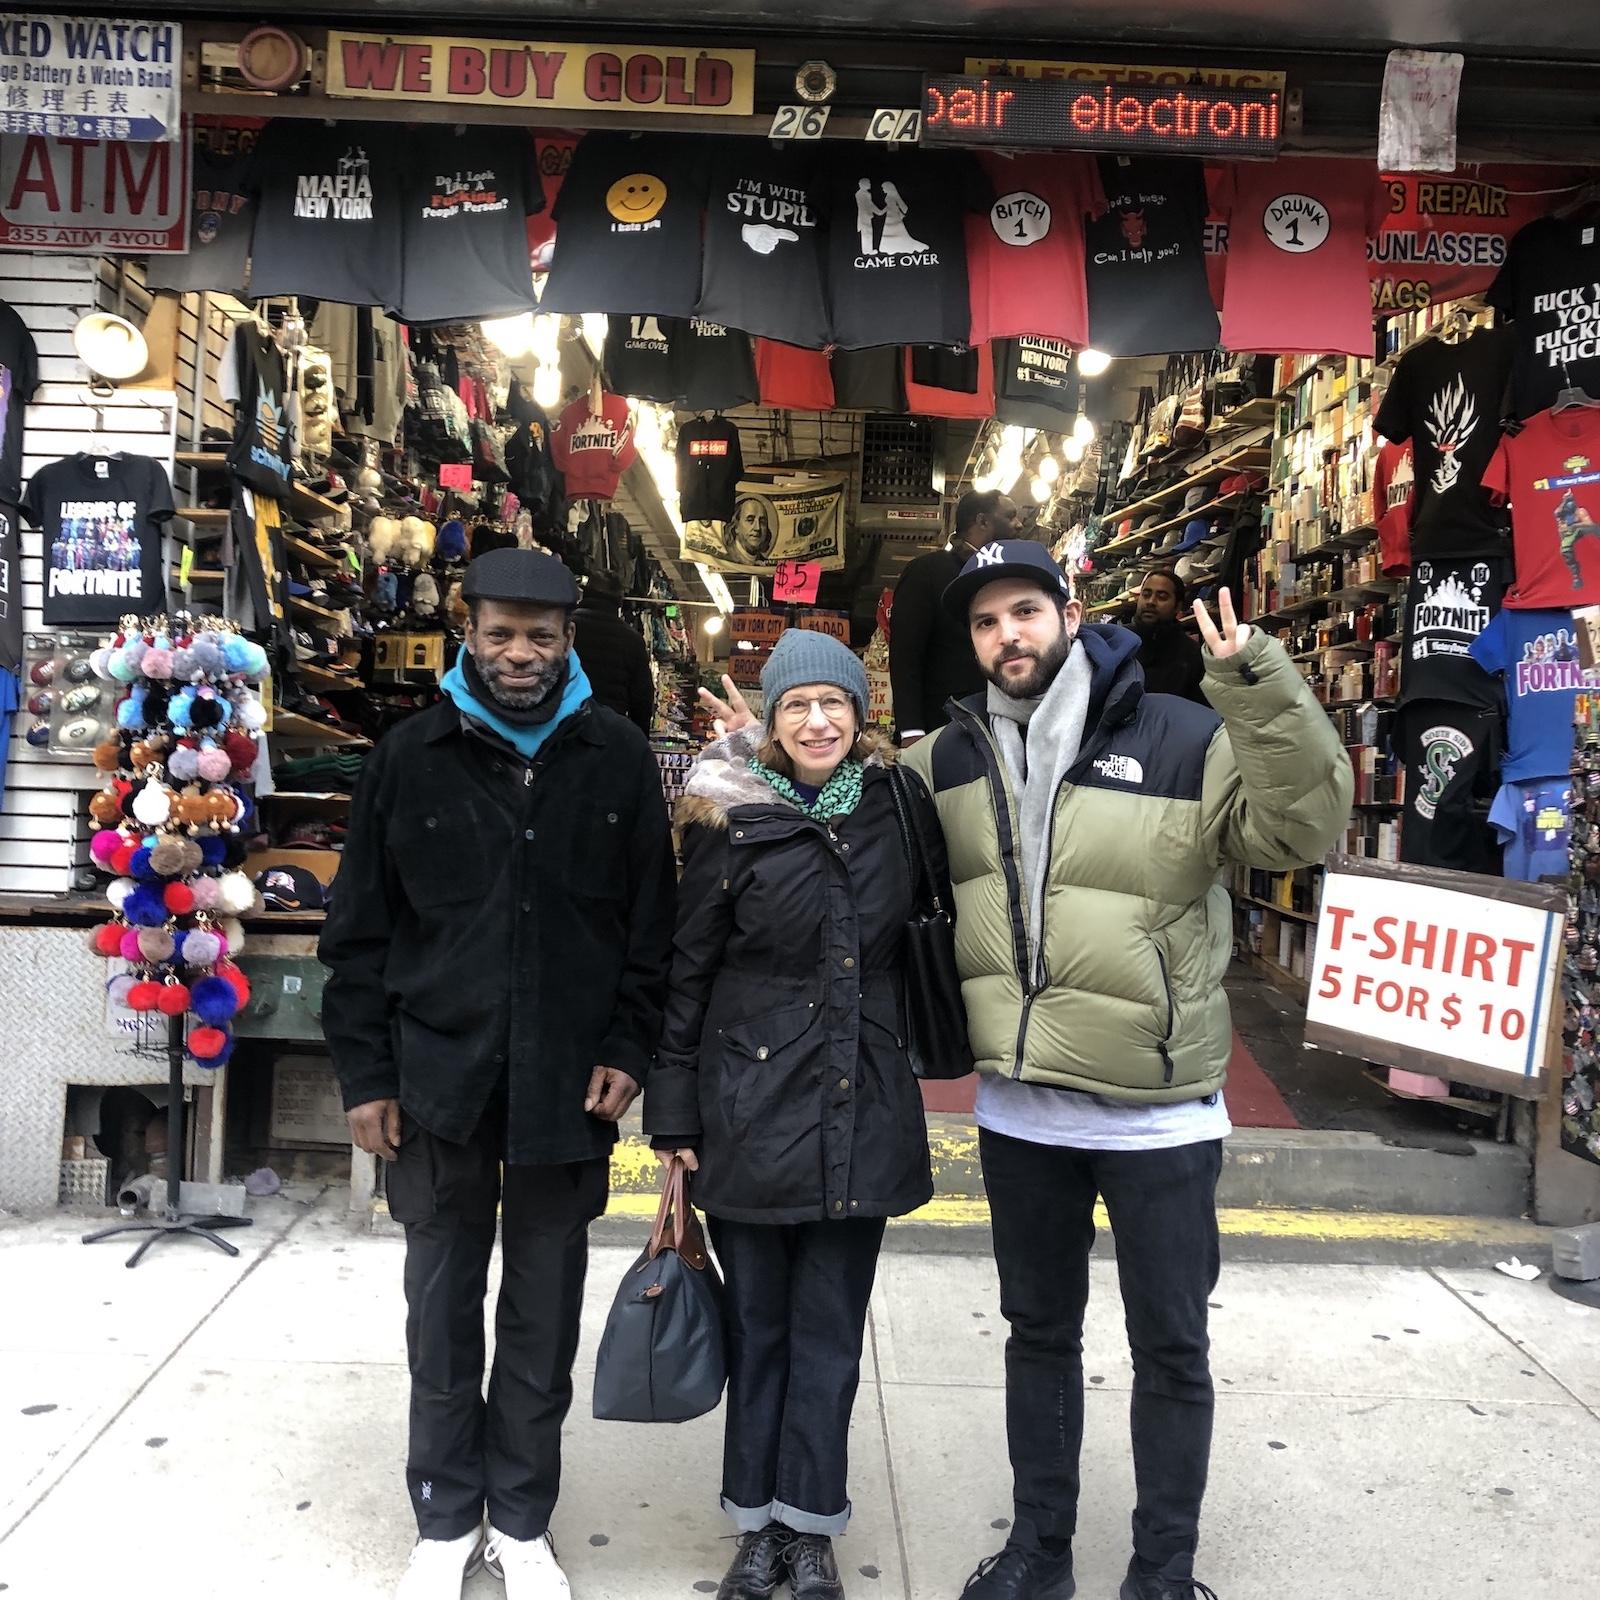 New York's Got Talent: Episode 11 - Roz Chast w/ co-host Tiger Hood